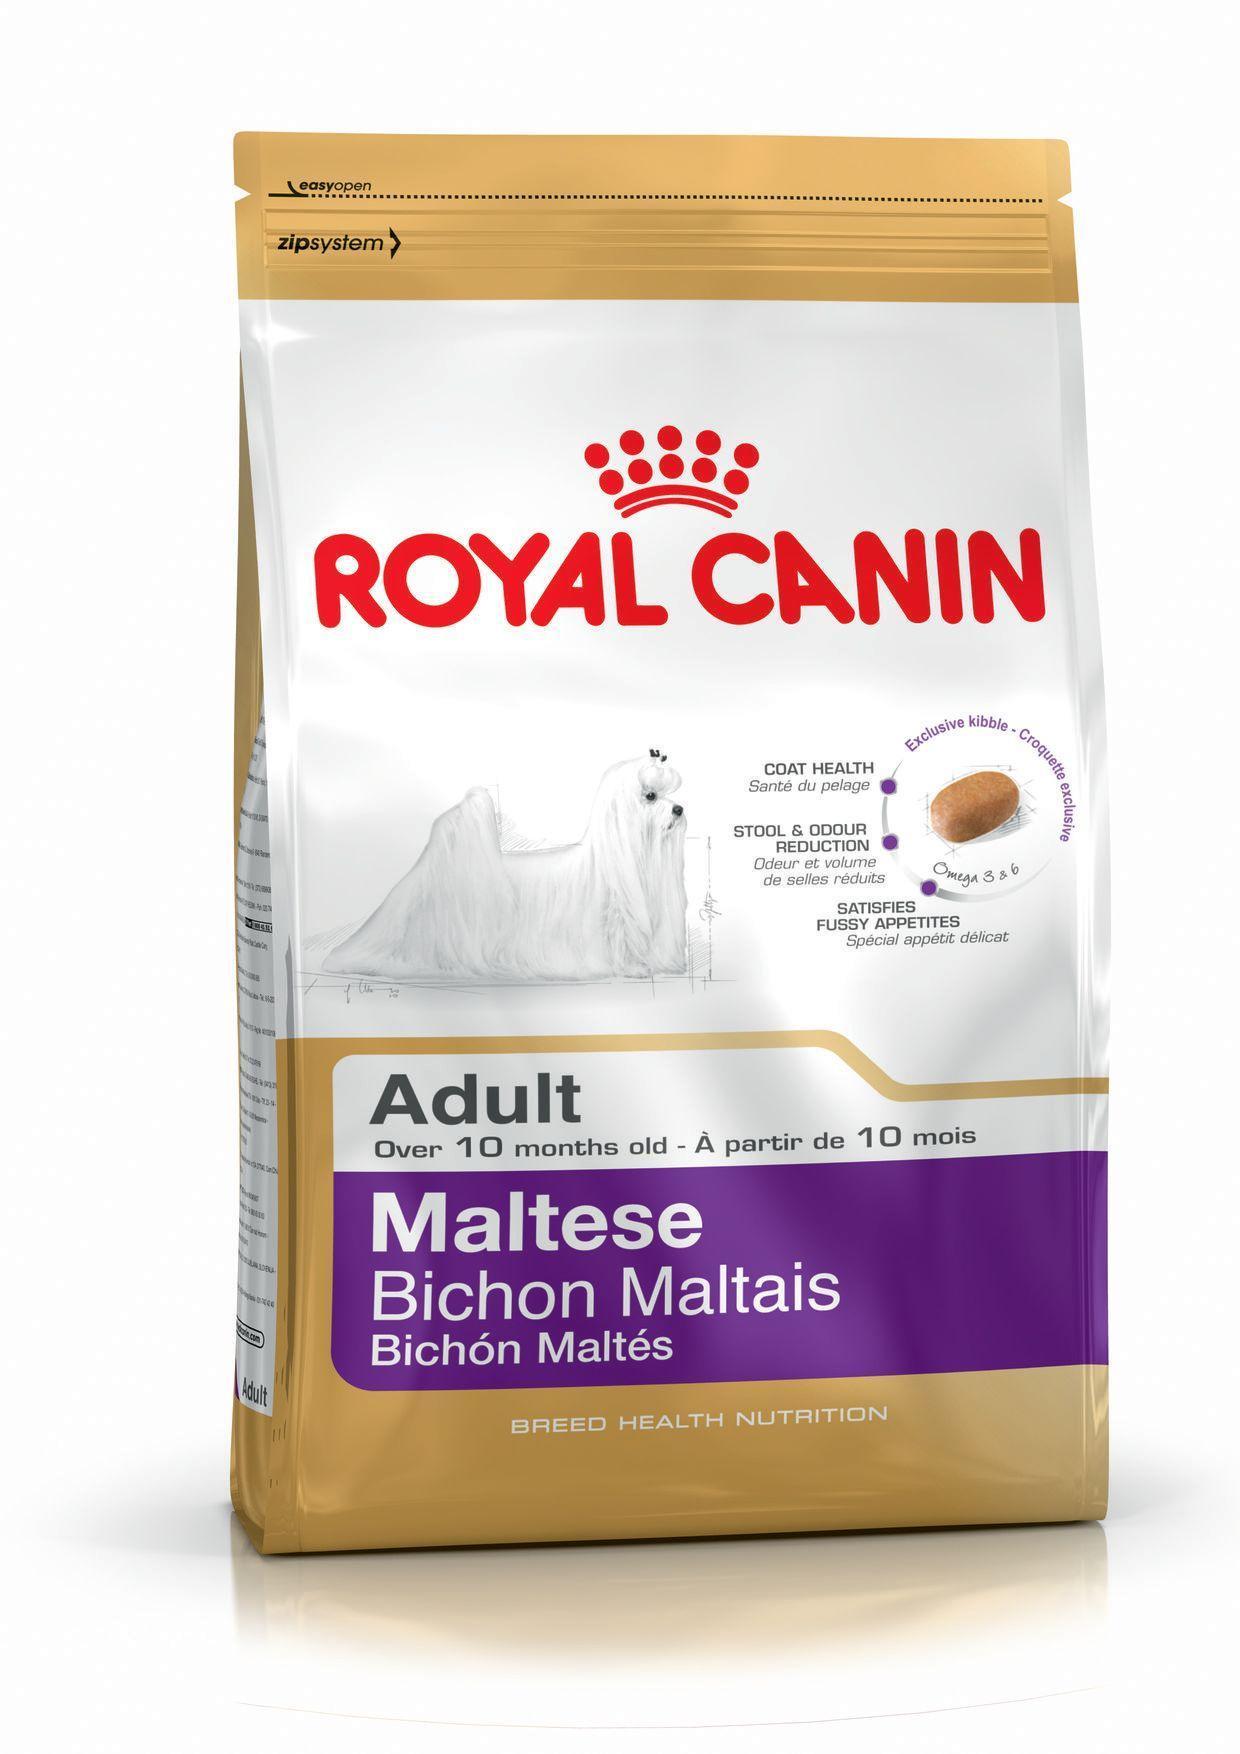 Royal Canin Maltes Adult